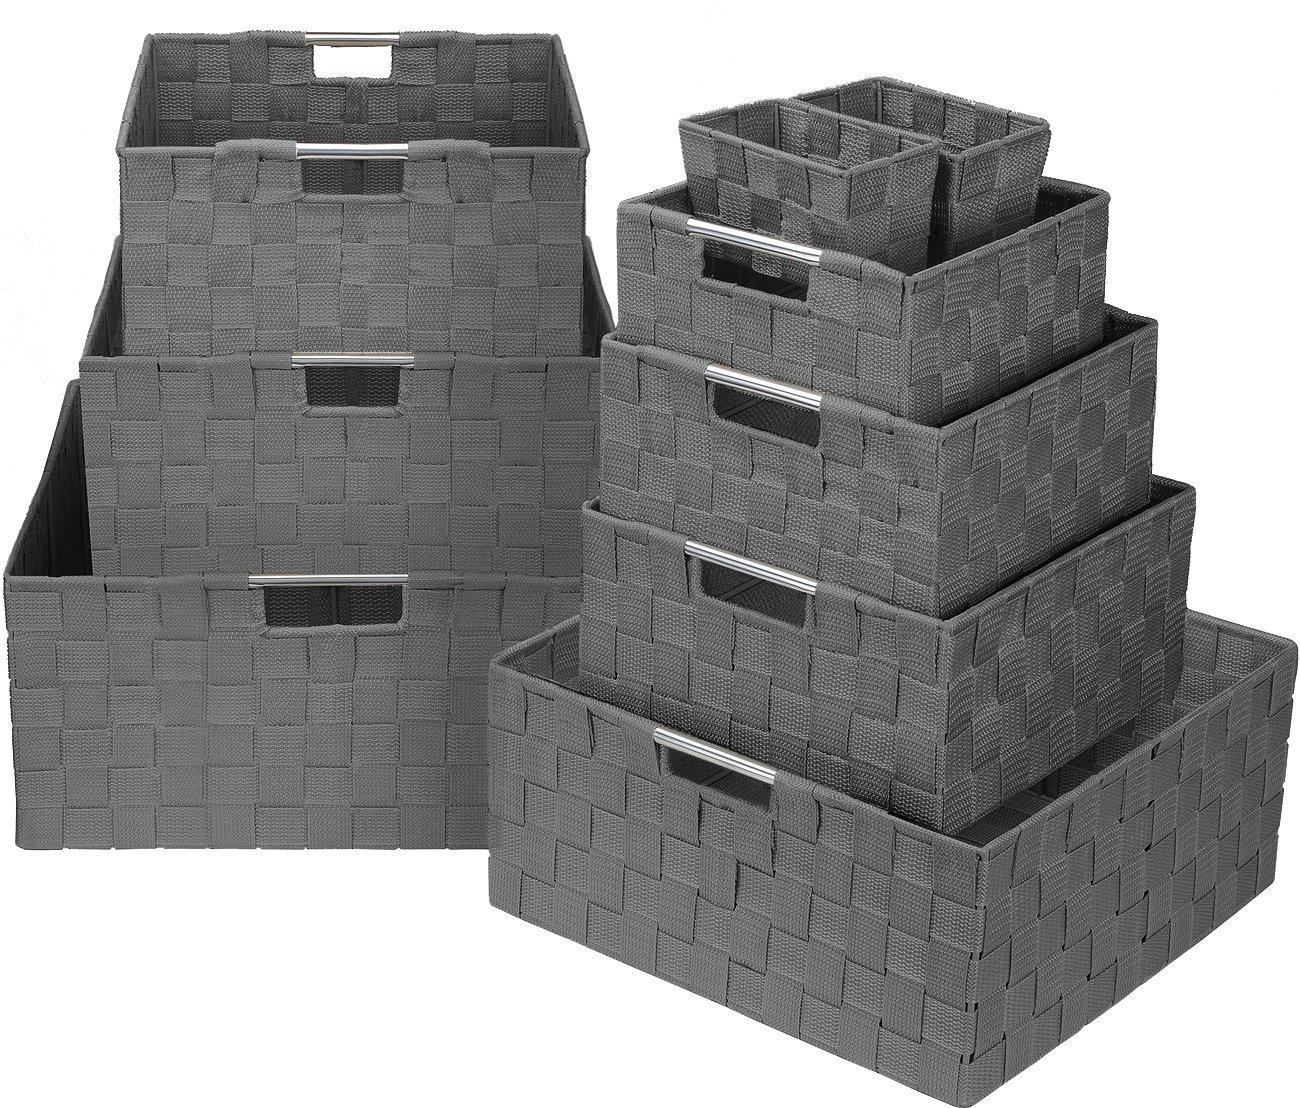 Sorbus Storage Box Woven Basket Bin Container Tote Cube Organizer Set Stackable Storage Basket Woven Strap Shelf Organizer Built-in Carry Handles (Gray)